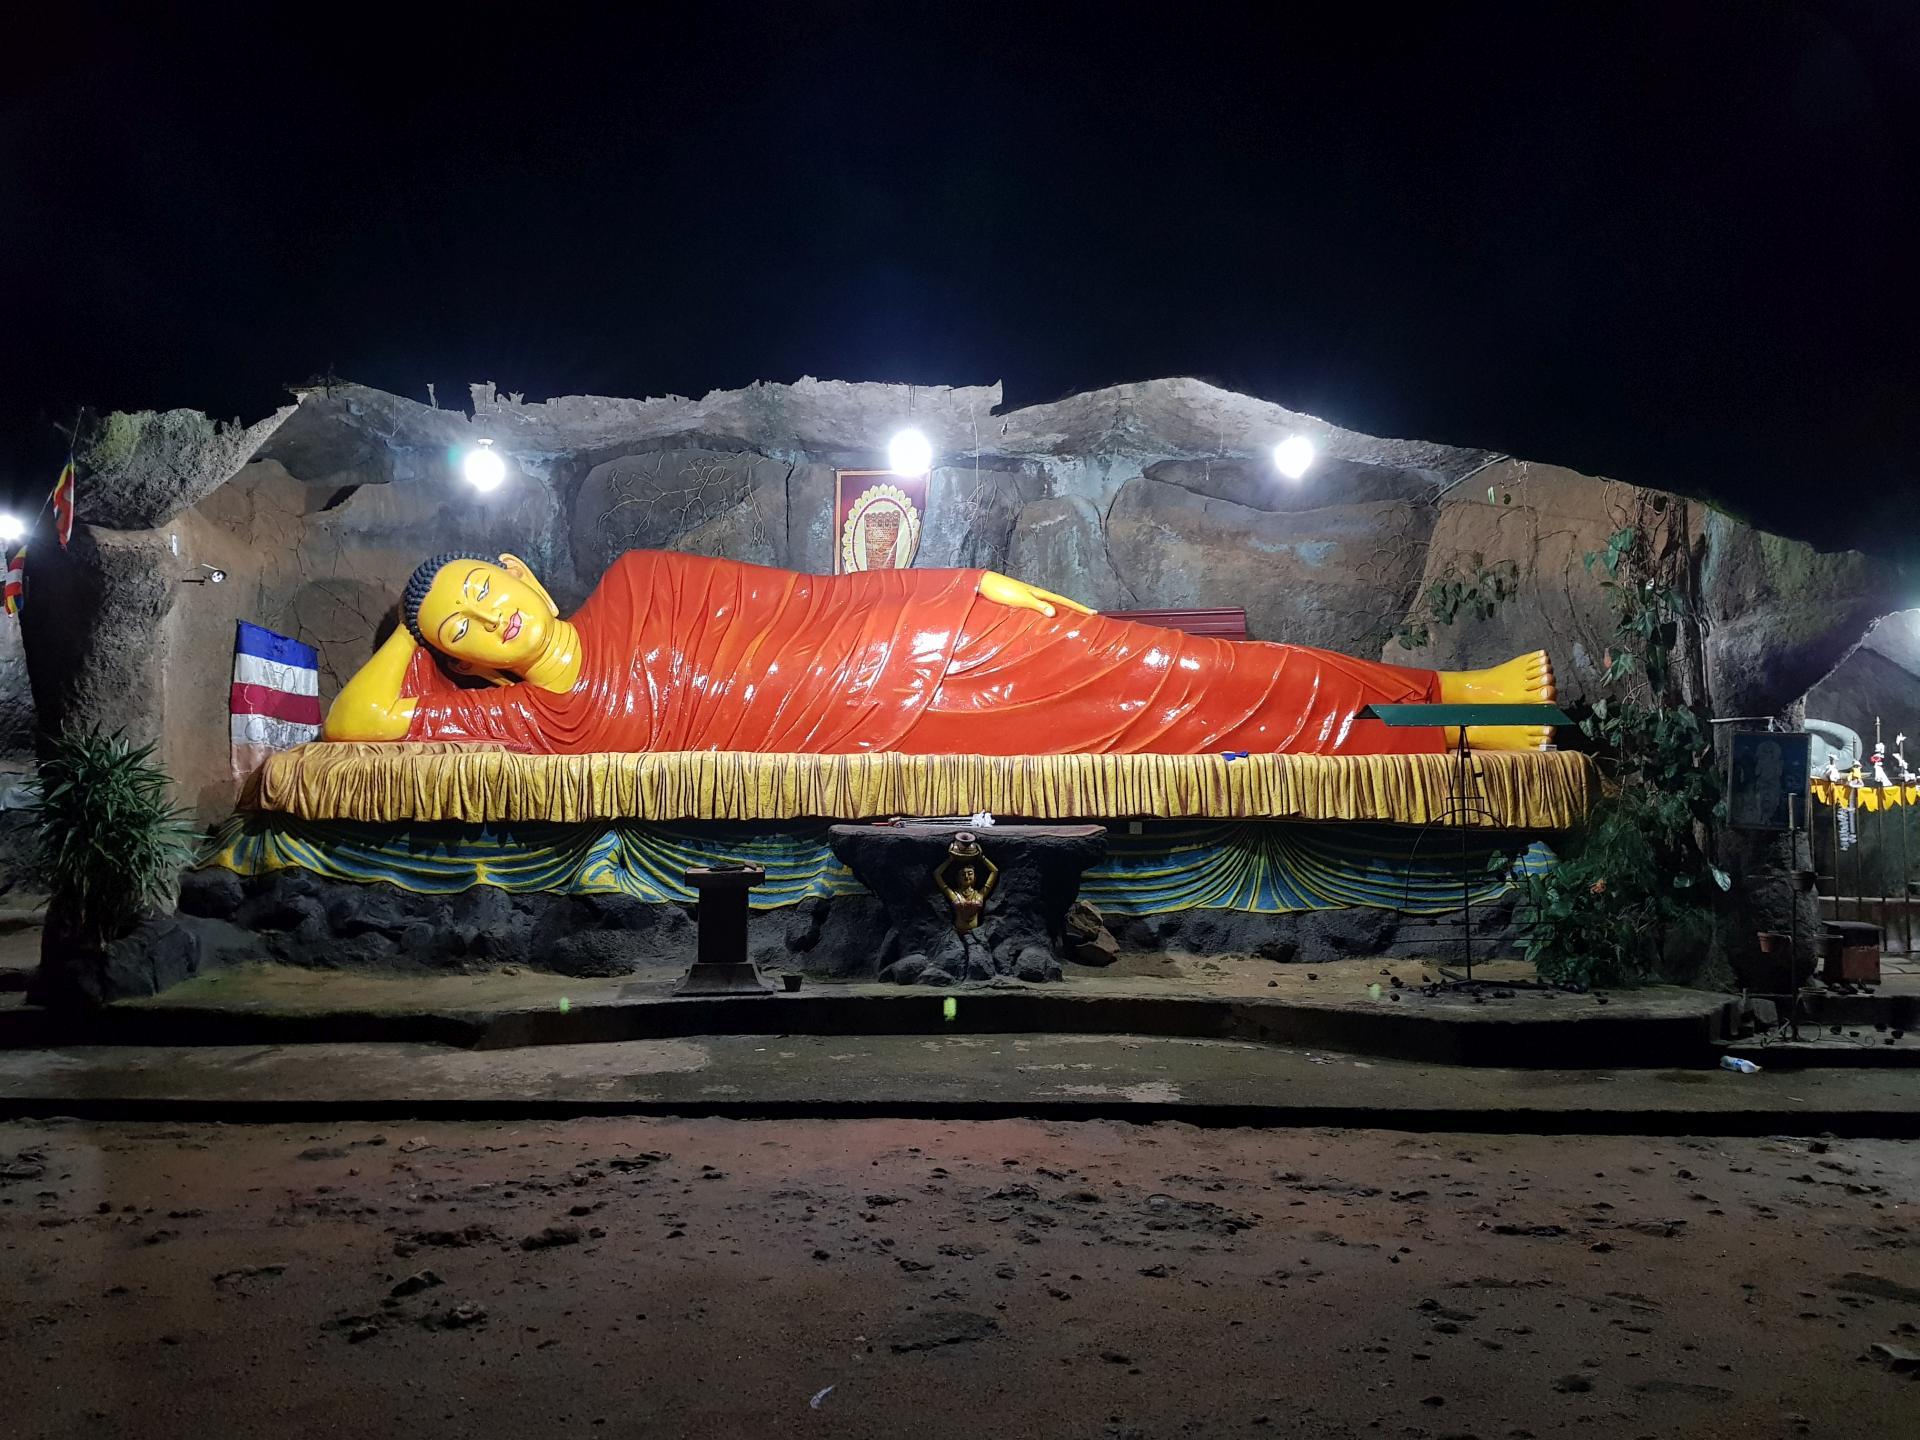 буддийский храм перед подъемом на пик Адама, Шри-Ланка